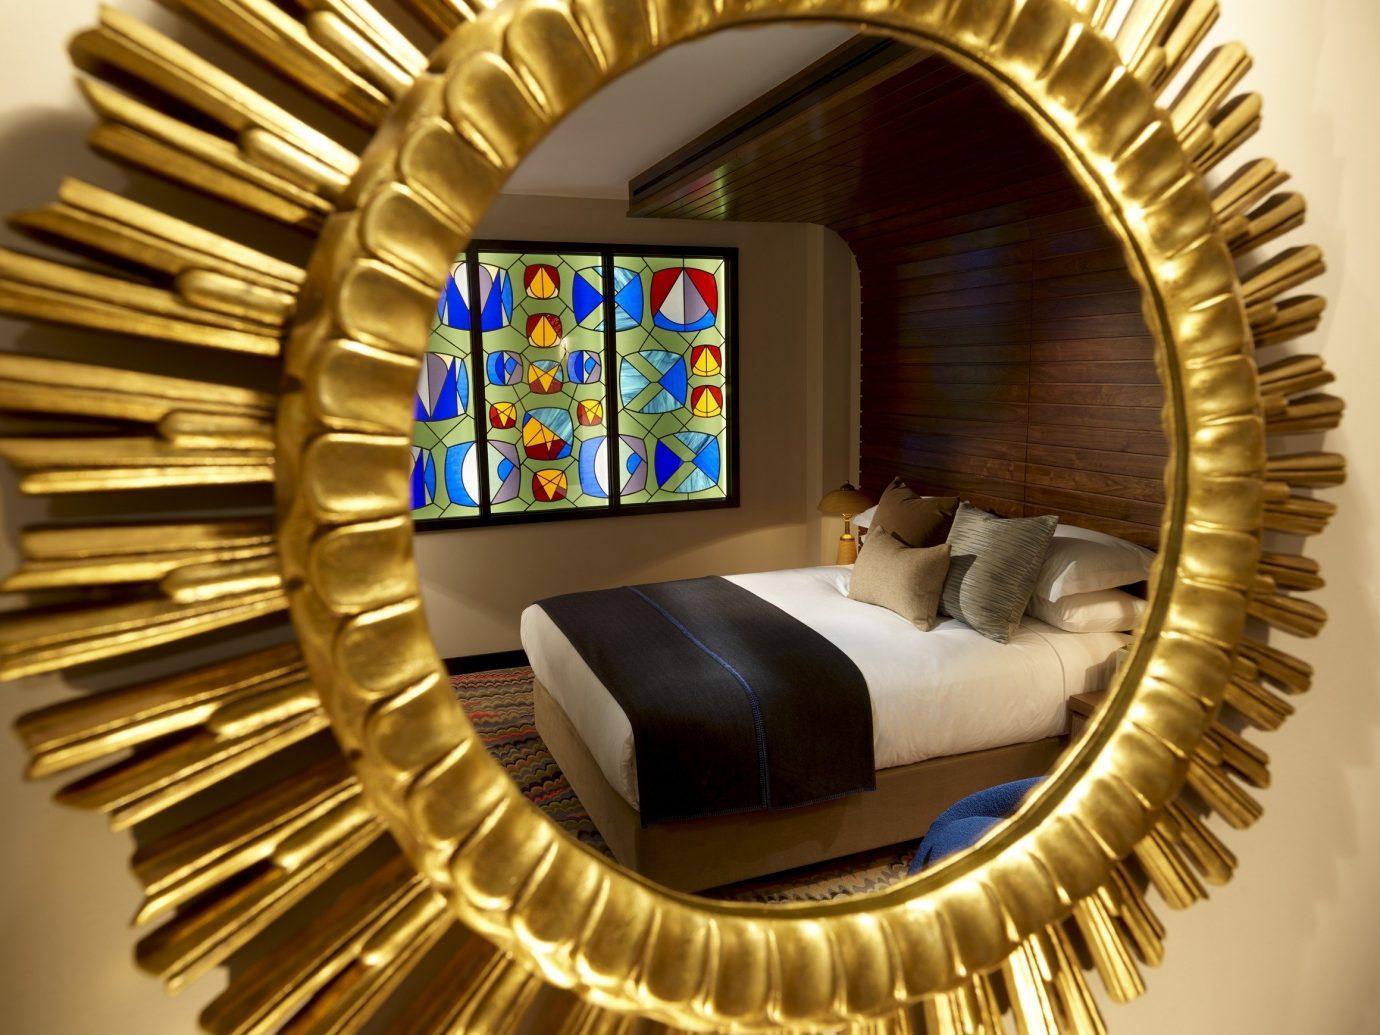 Budget Hotels London color metalware living room interior design modern art circle spiral Design window decorated gear